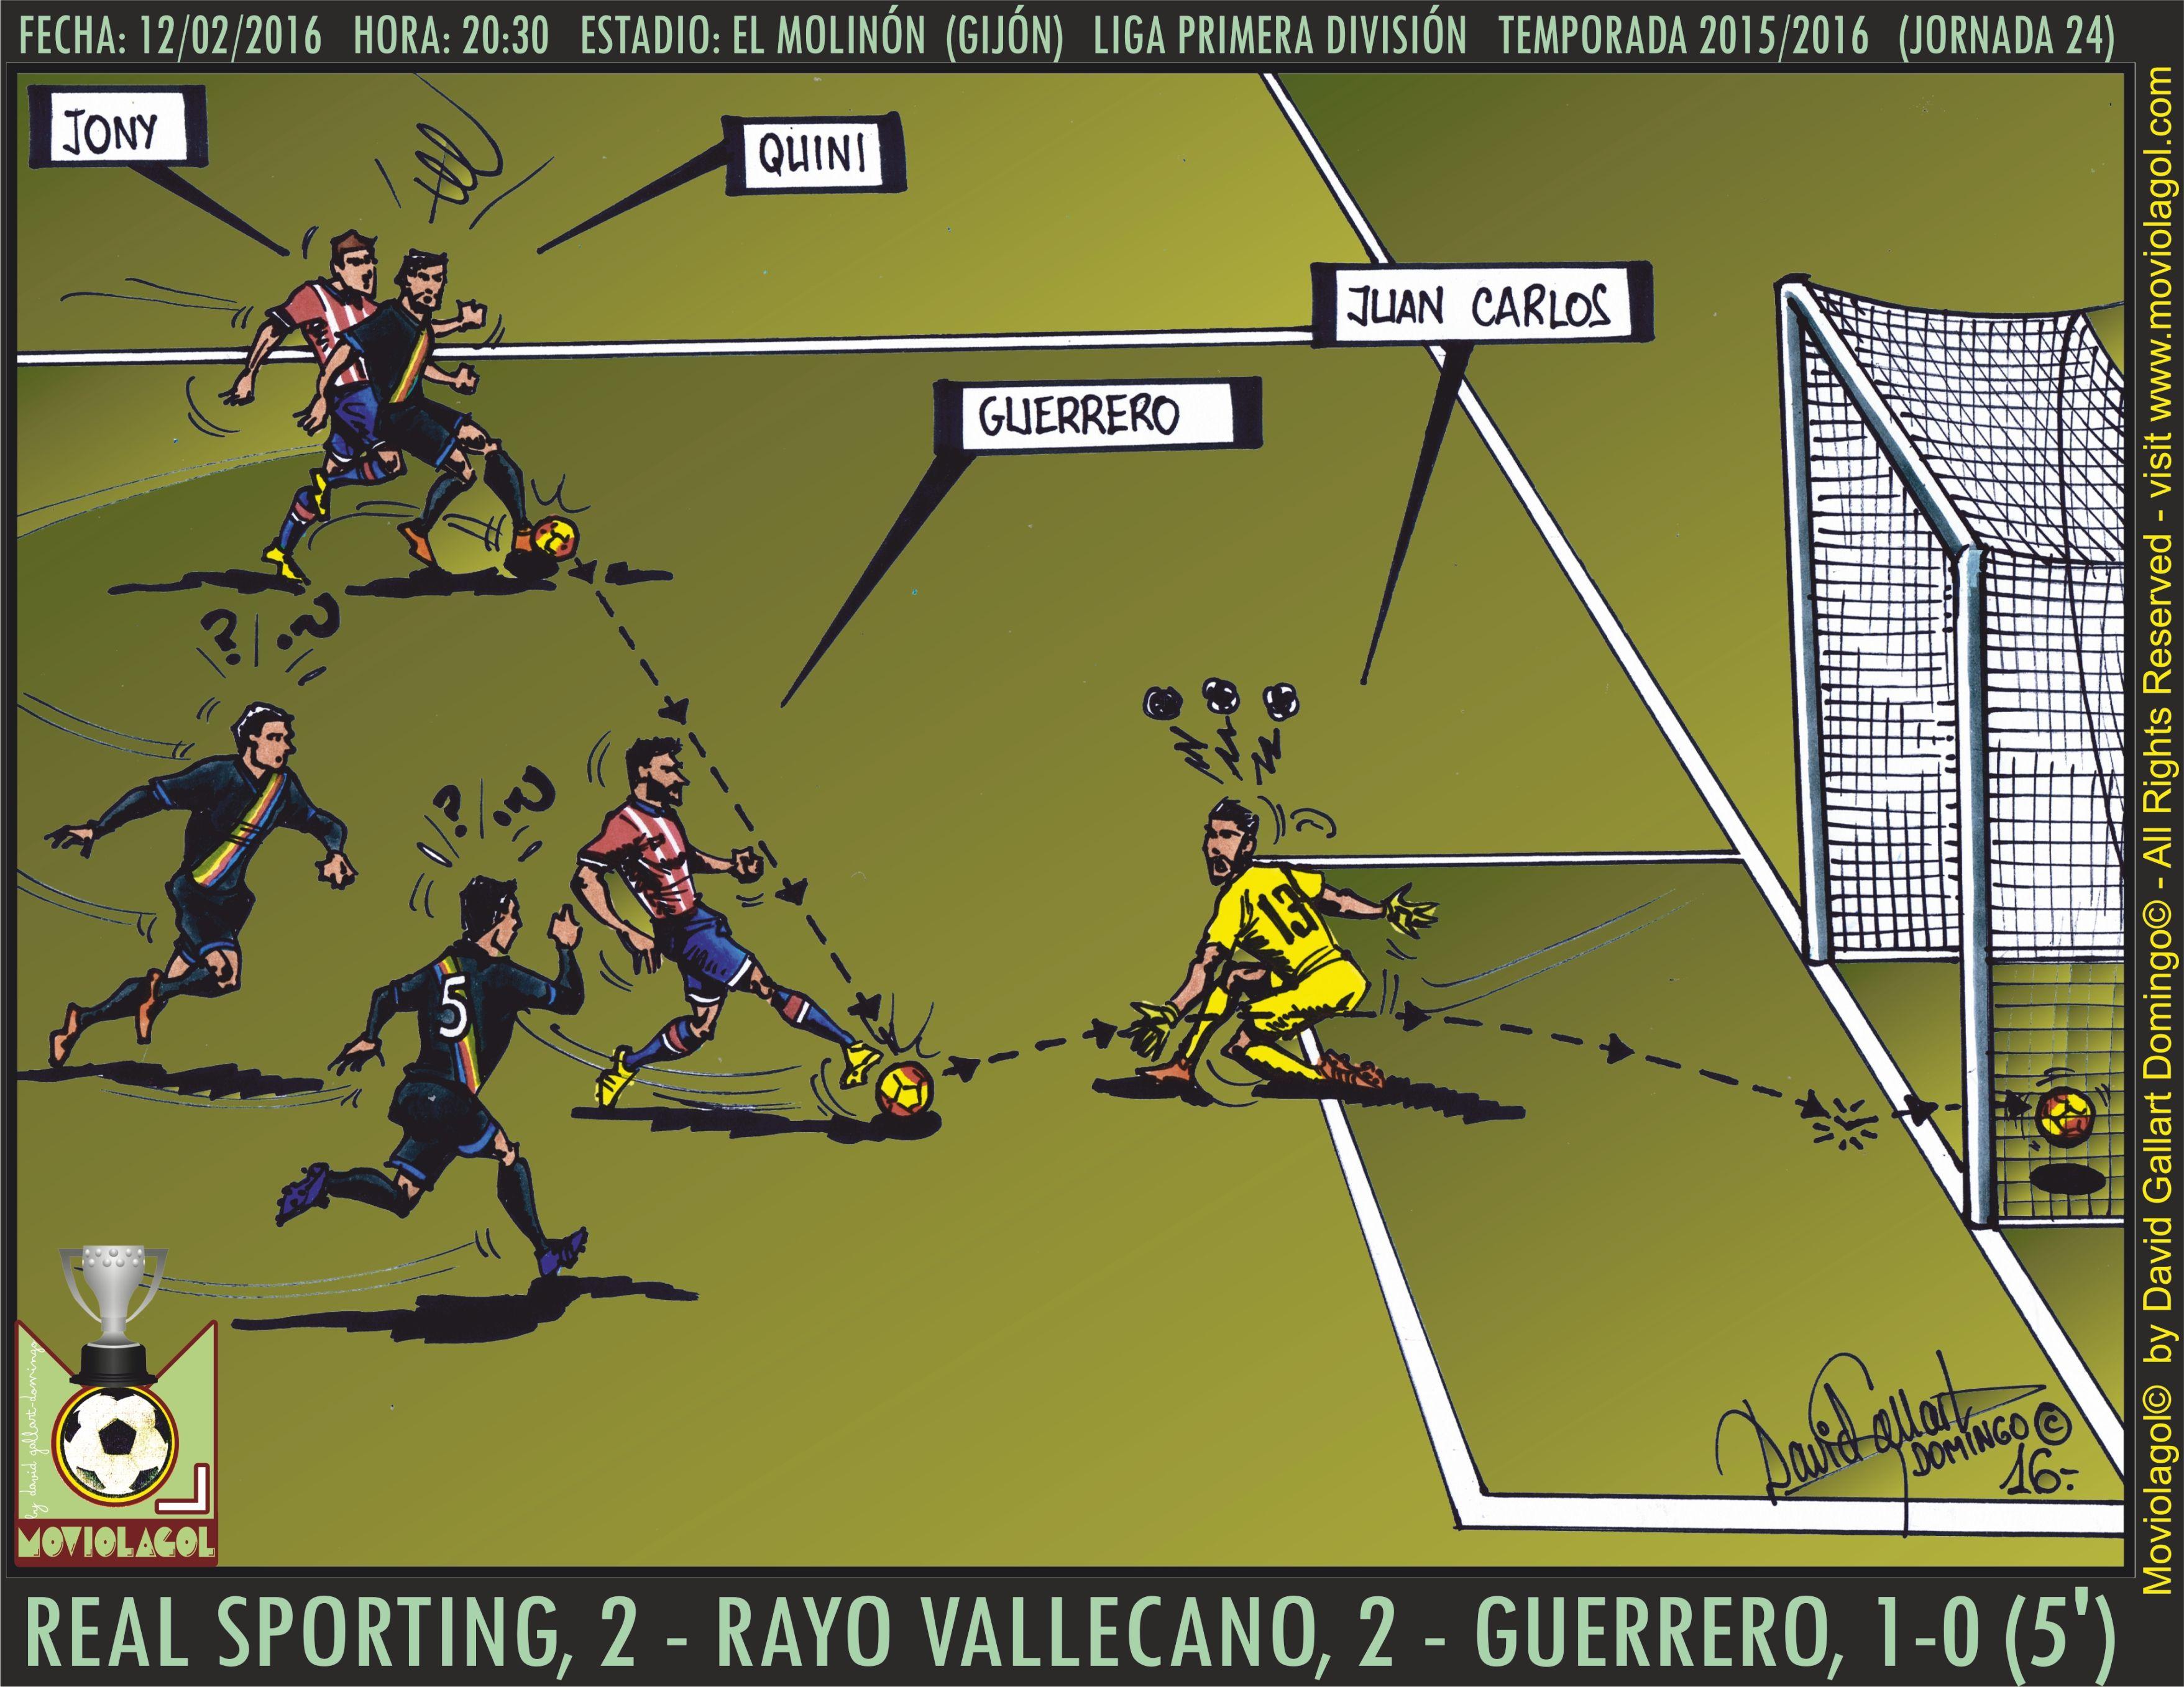 Moviolagol_by_David Gallart Domingo_La_Liga_2015-2016_J_24_Real Sporting, 2 - Rayo Vallecano, 2 - Guerrero, 1-0 (5')